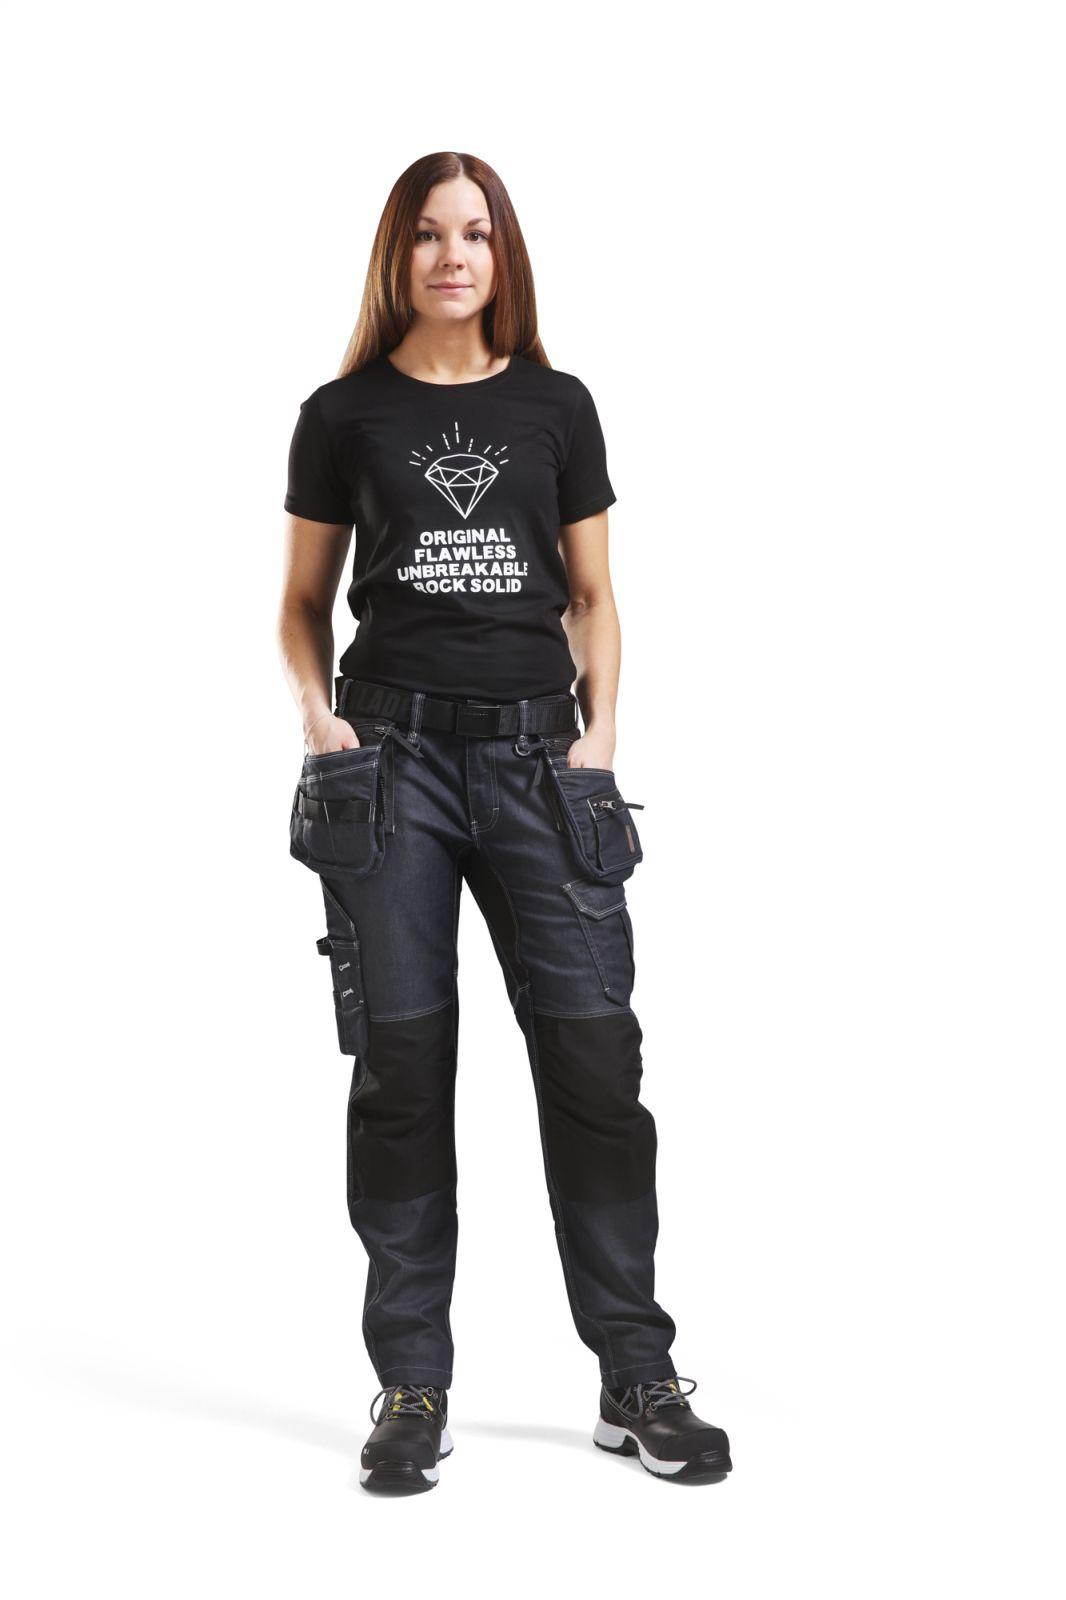 Blaklader Dames T-shirts 91881042 zwart(9900)